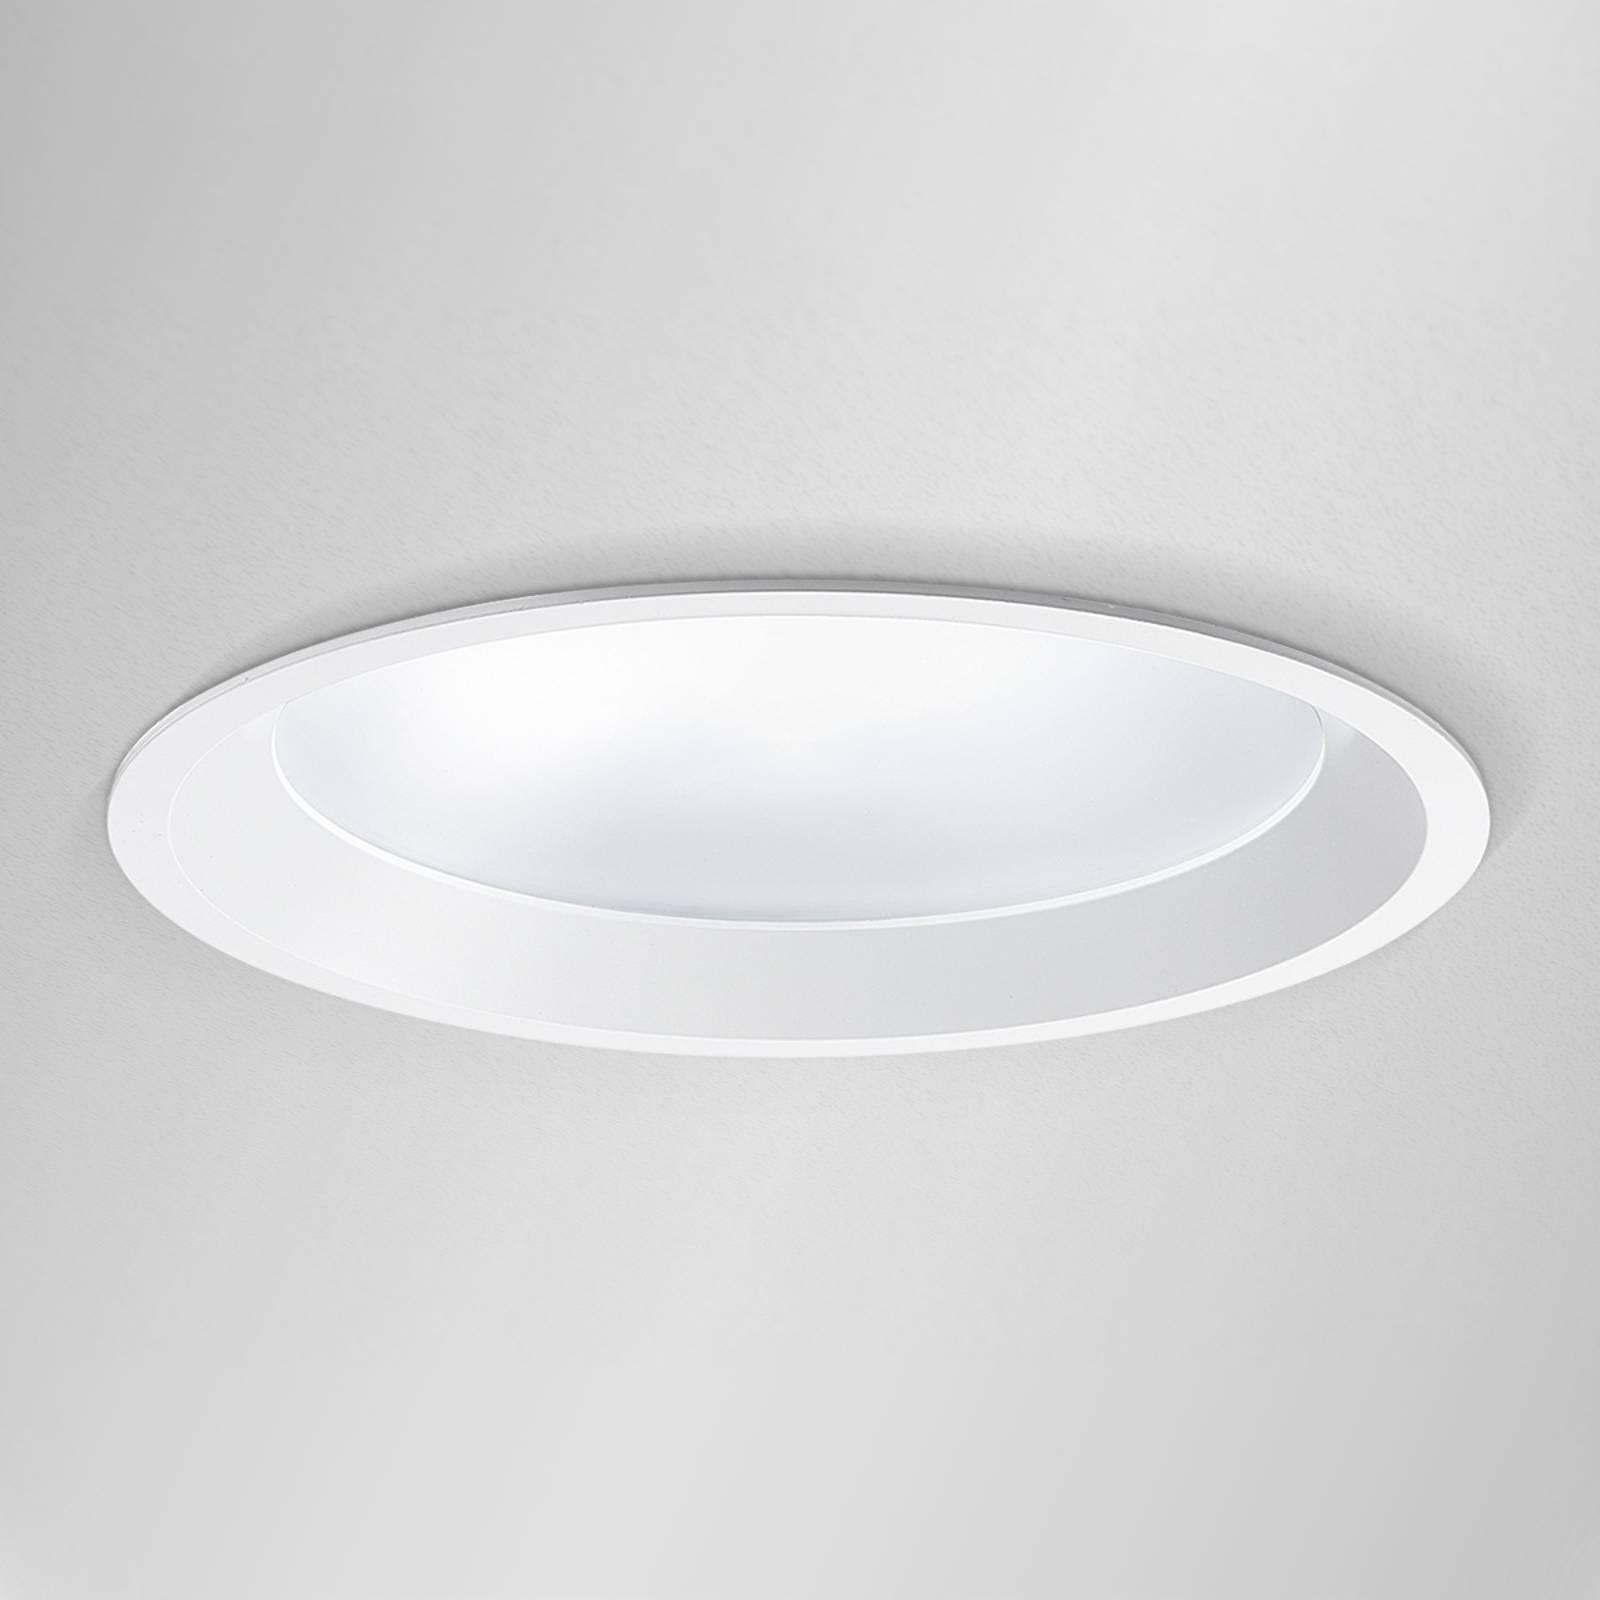 Diamètre 19cm - downlight encastré LED Strato 190